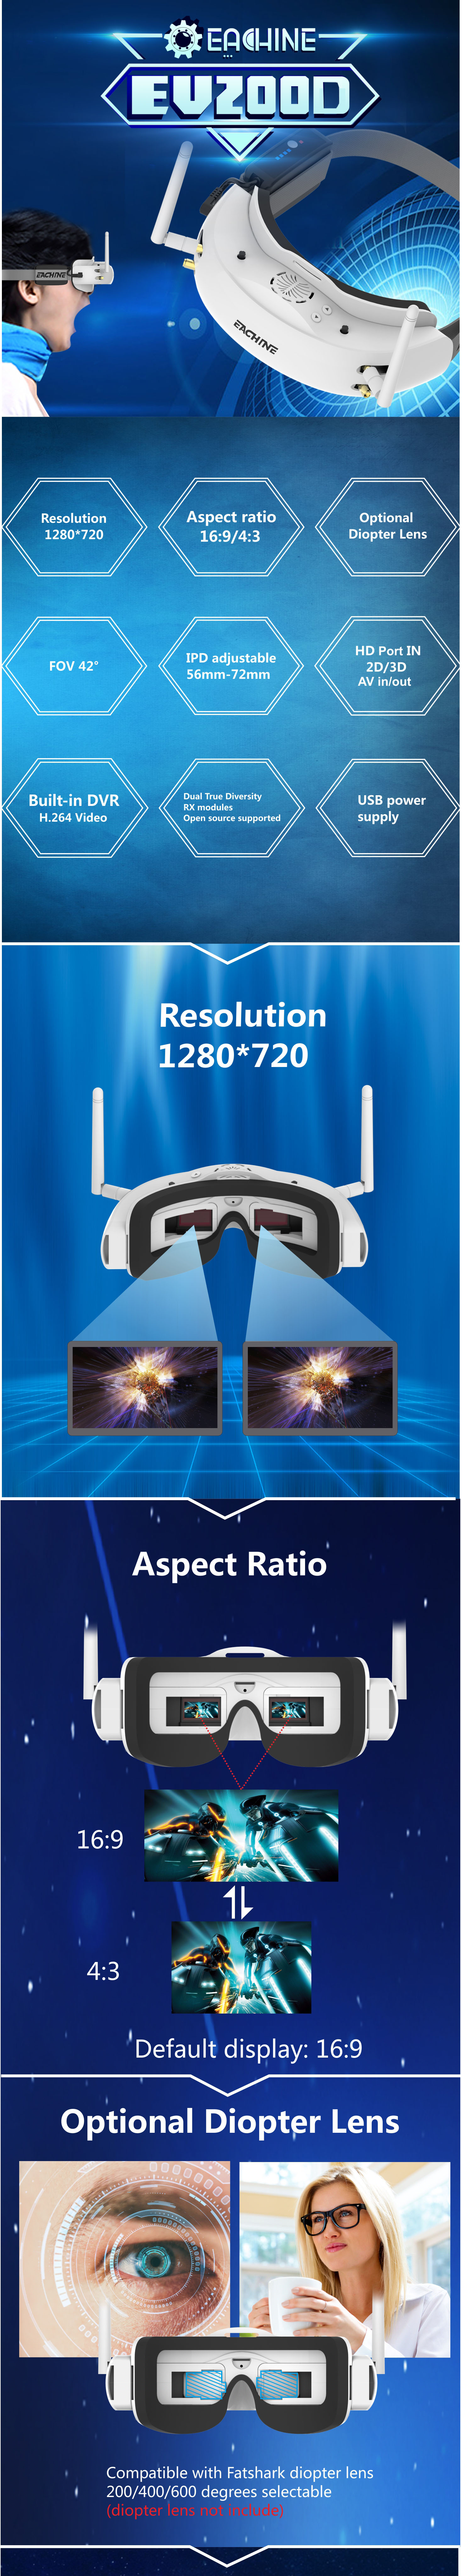 FPV очки Eachine EV200D: характеристики и фото